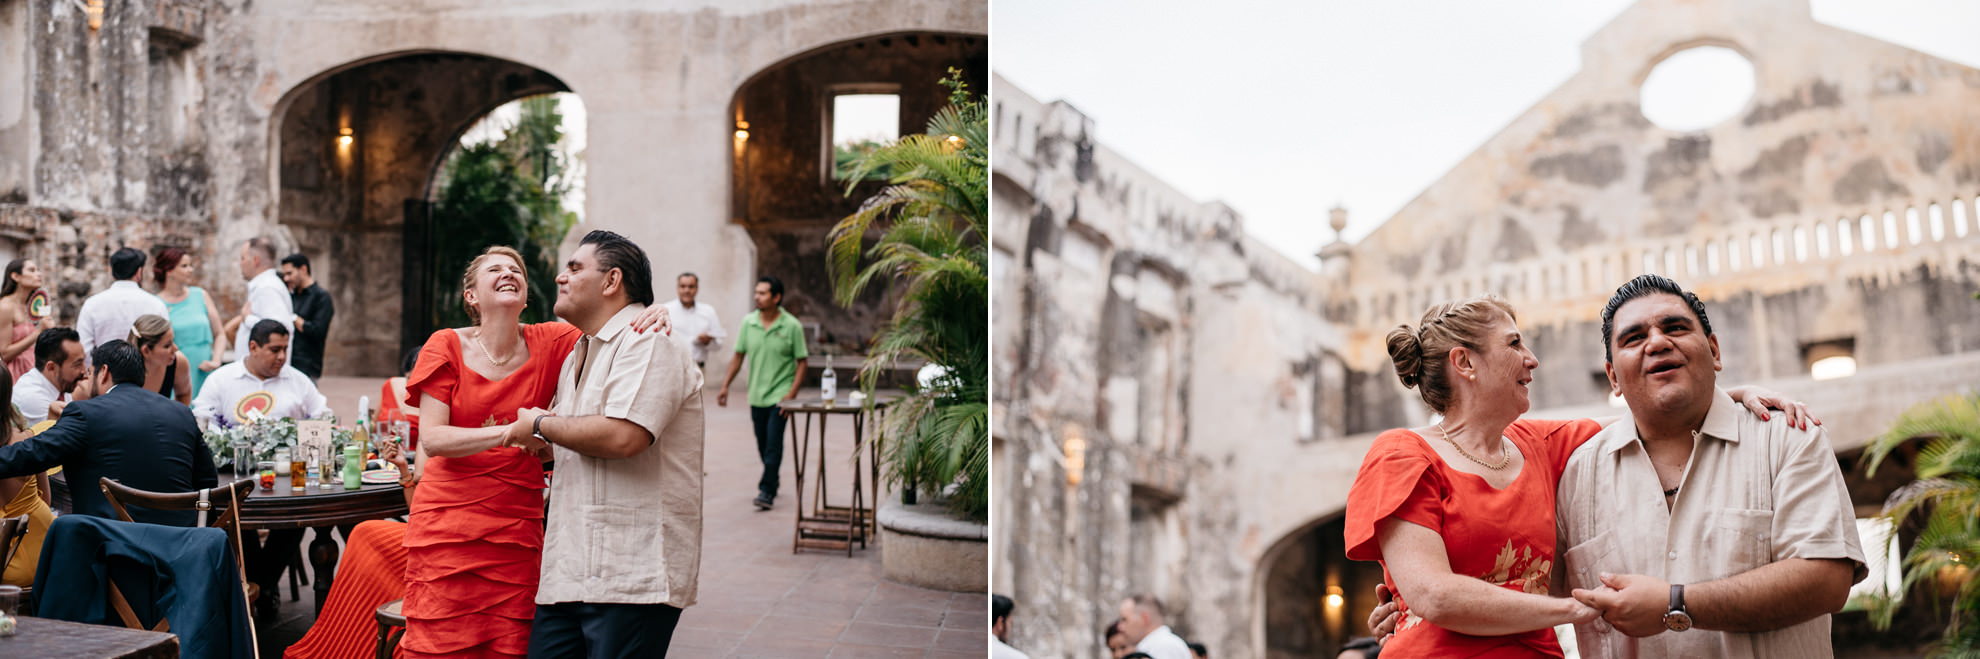 115 - hacienda san carlos.jpg